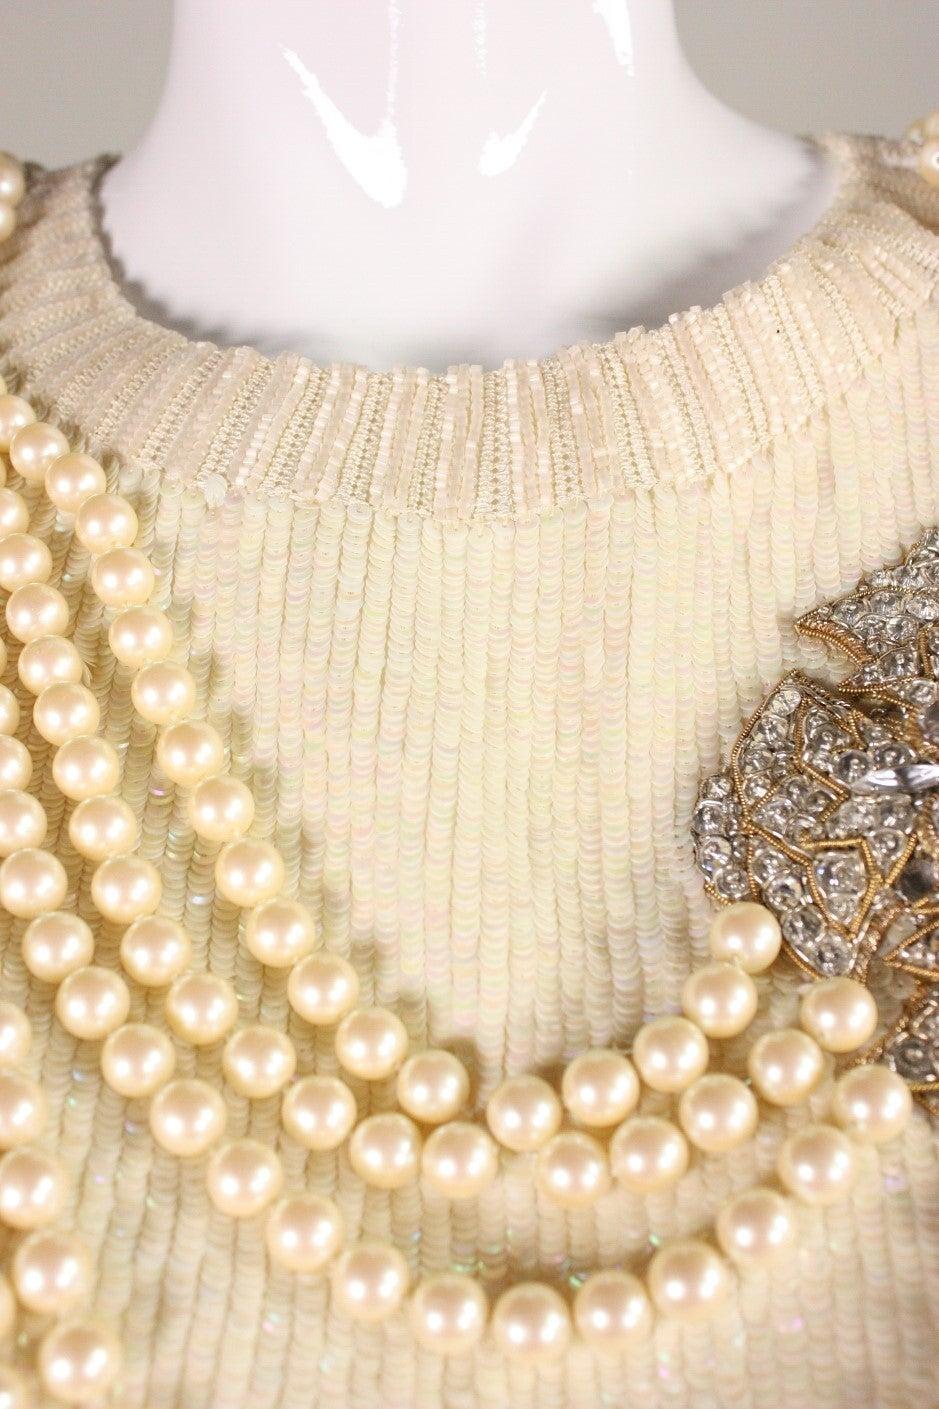 Vintage Bill Blass Sequined Encrusted Blouse with Trompe l'Oiel Details 6